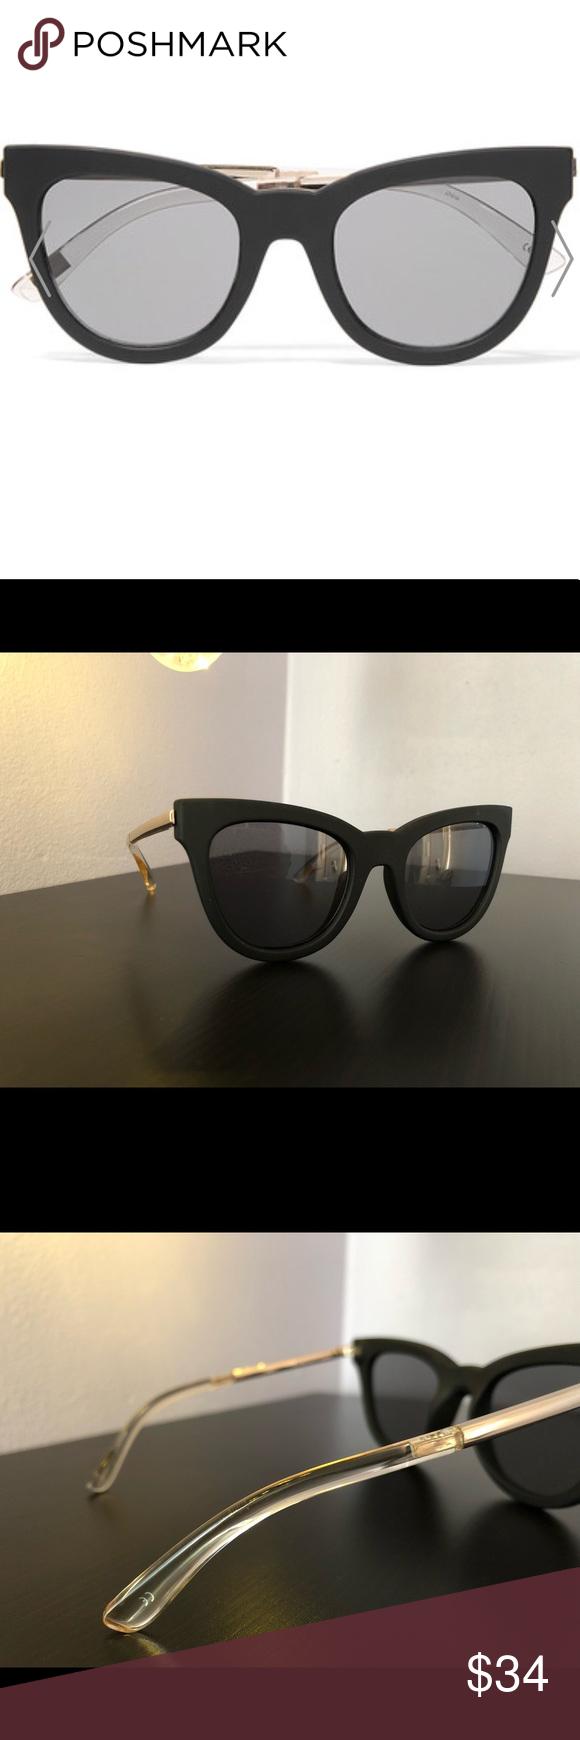 e04d6602bd Le Specs Le Dubutante 1502117 Brand New Le Specs Le Debutante cat-eye rubber  and gold-tone sunglasses Le Specs Accessories Sunglasses